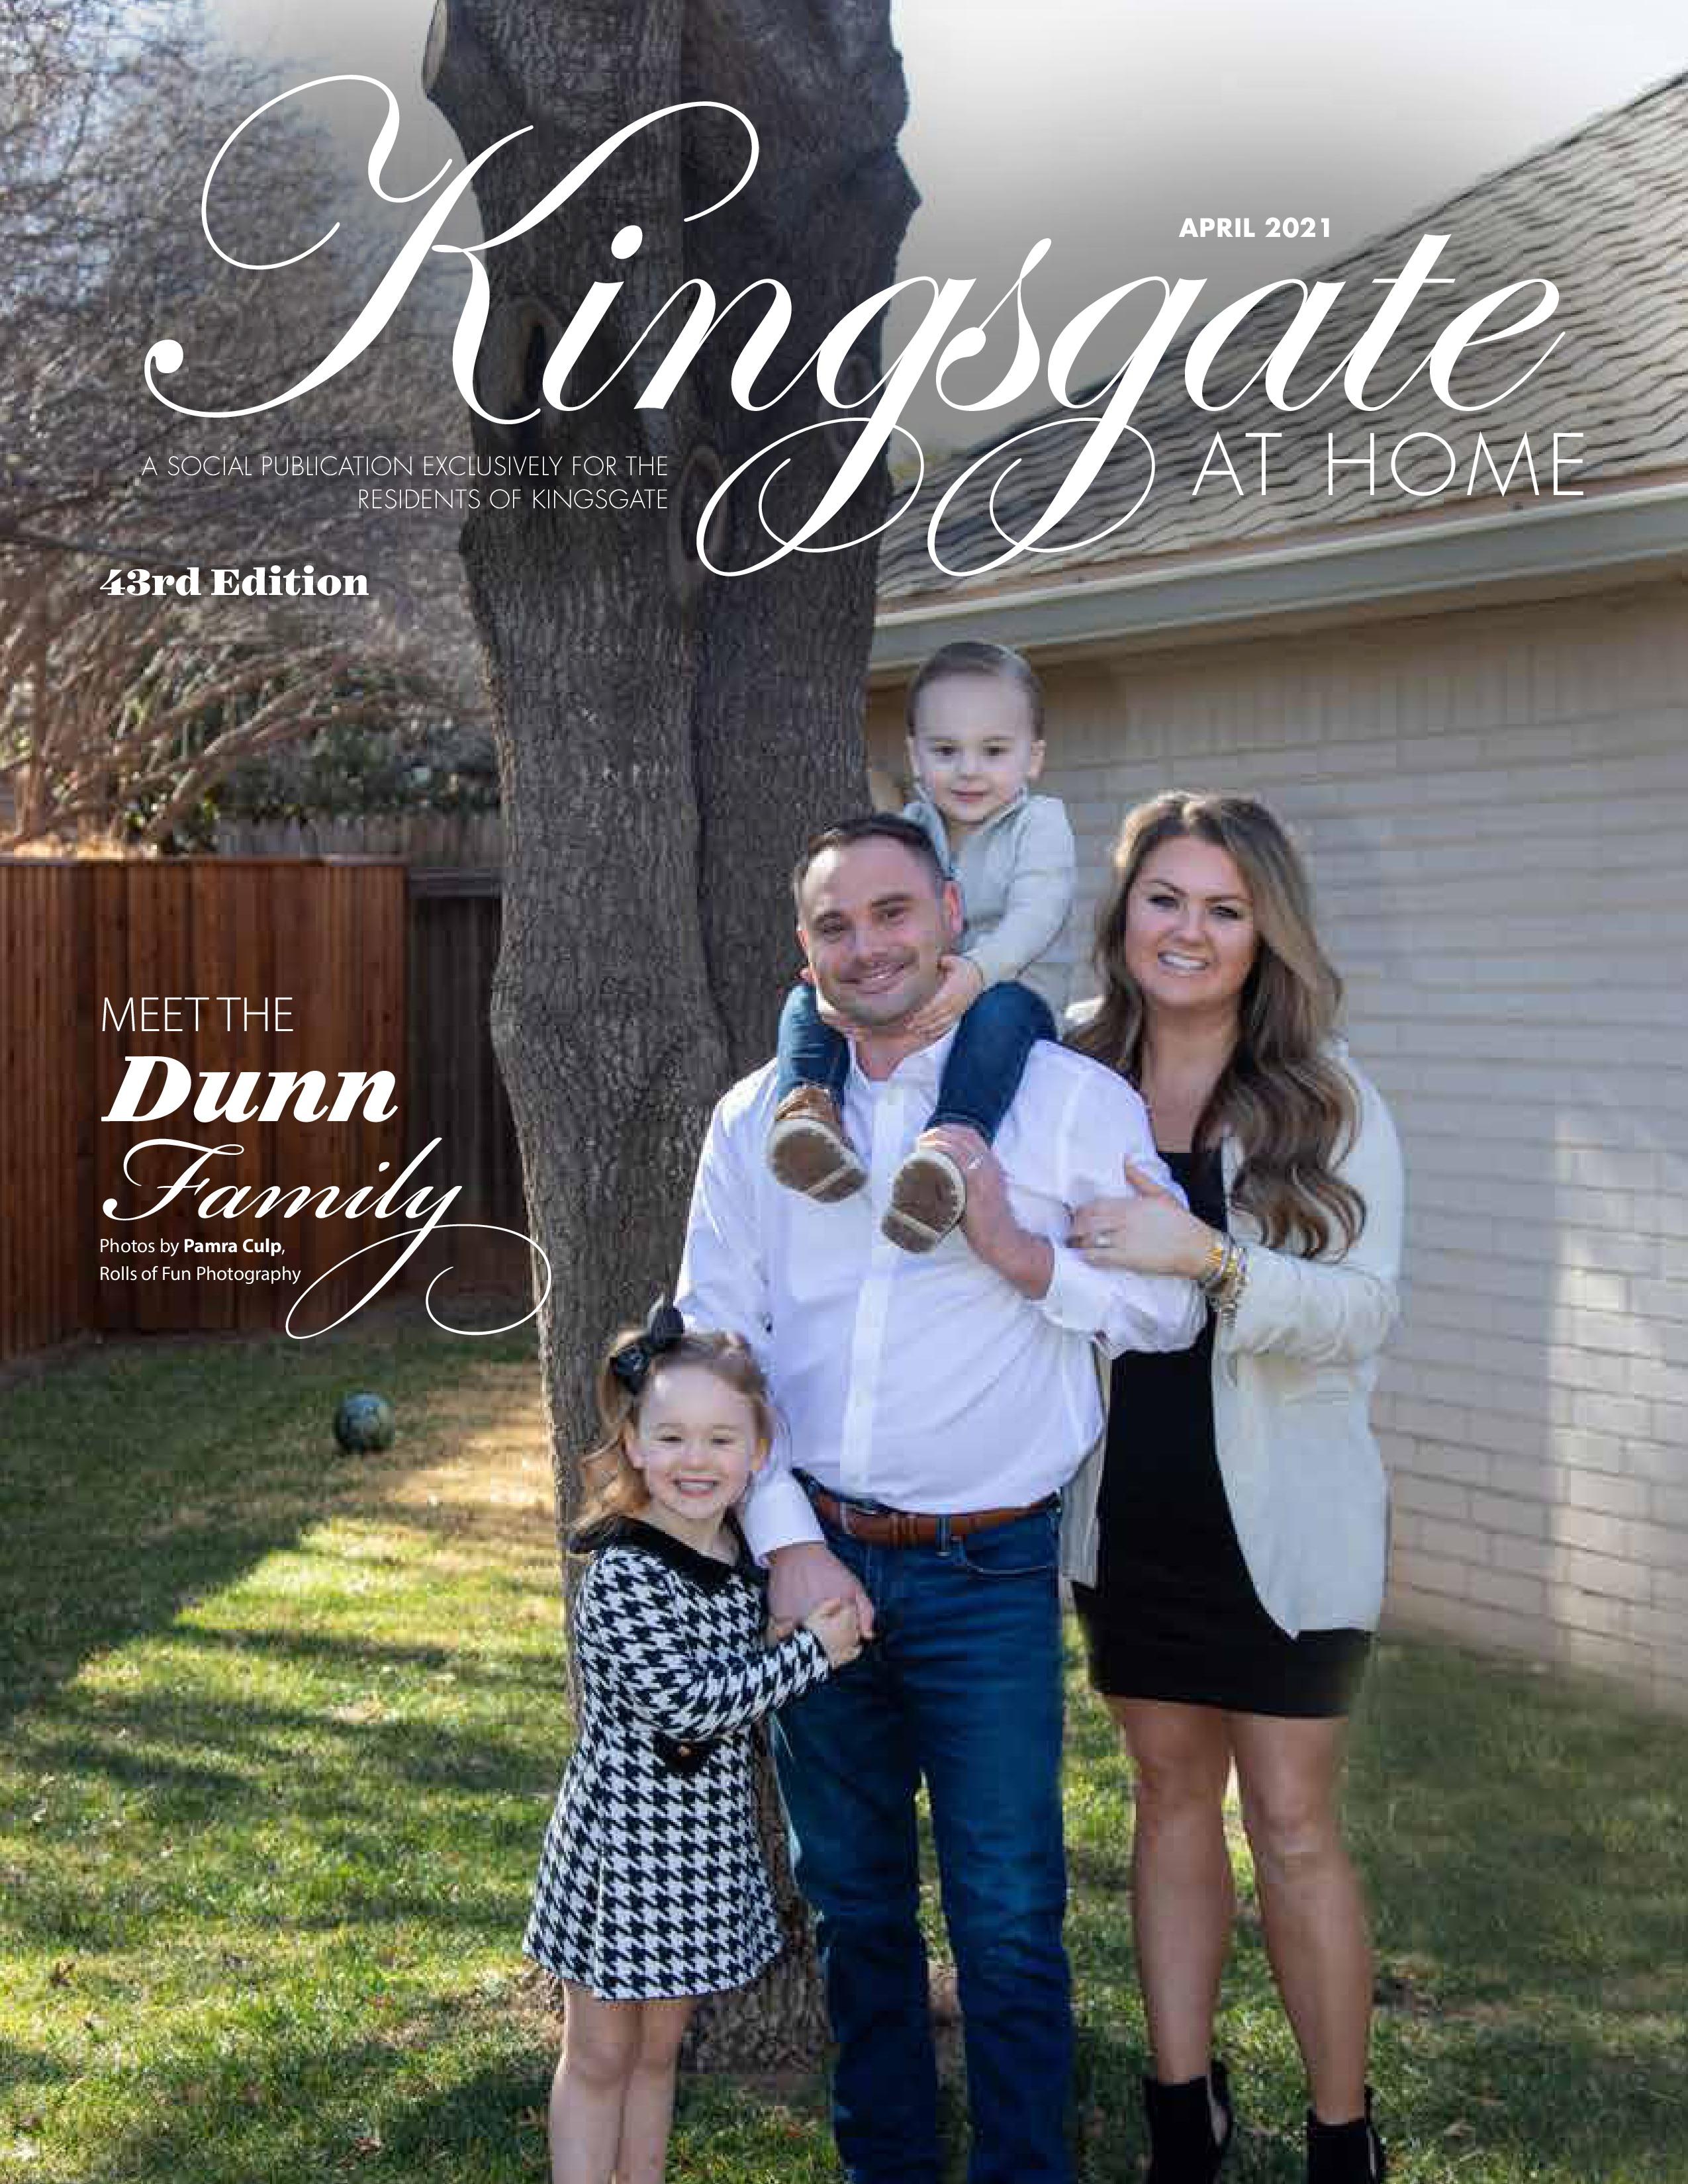 Kingsgate at Home 2021-04-01